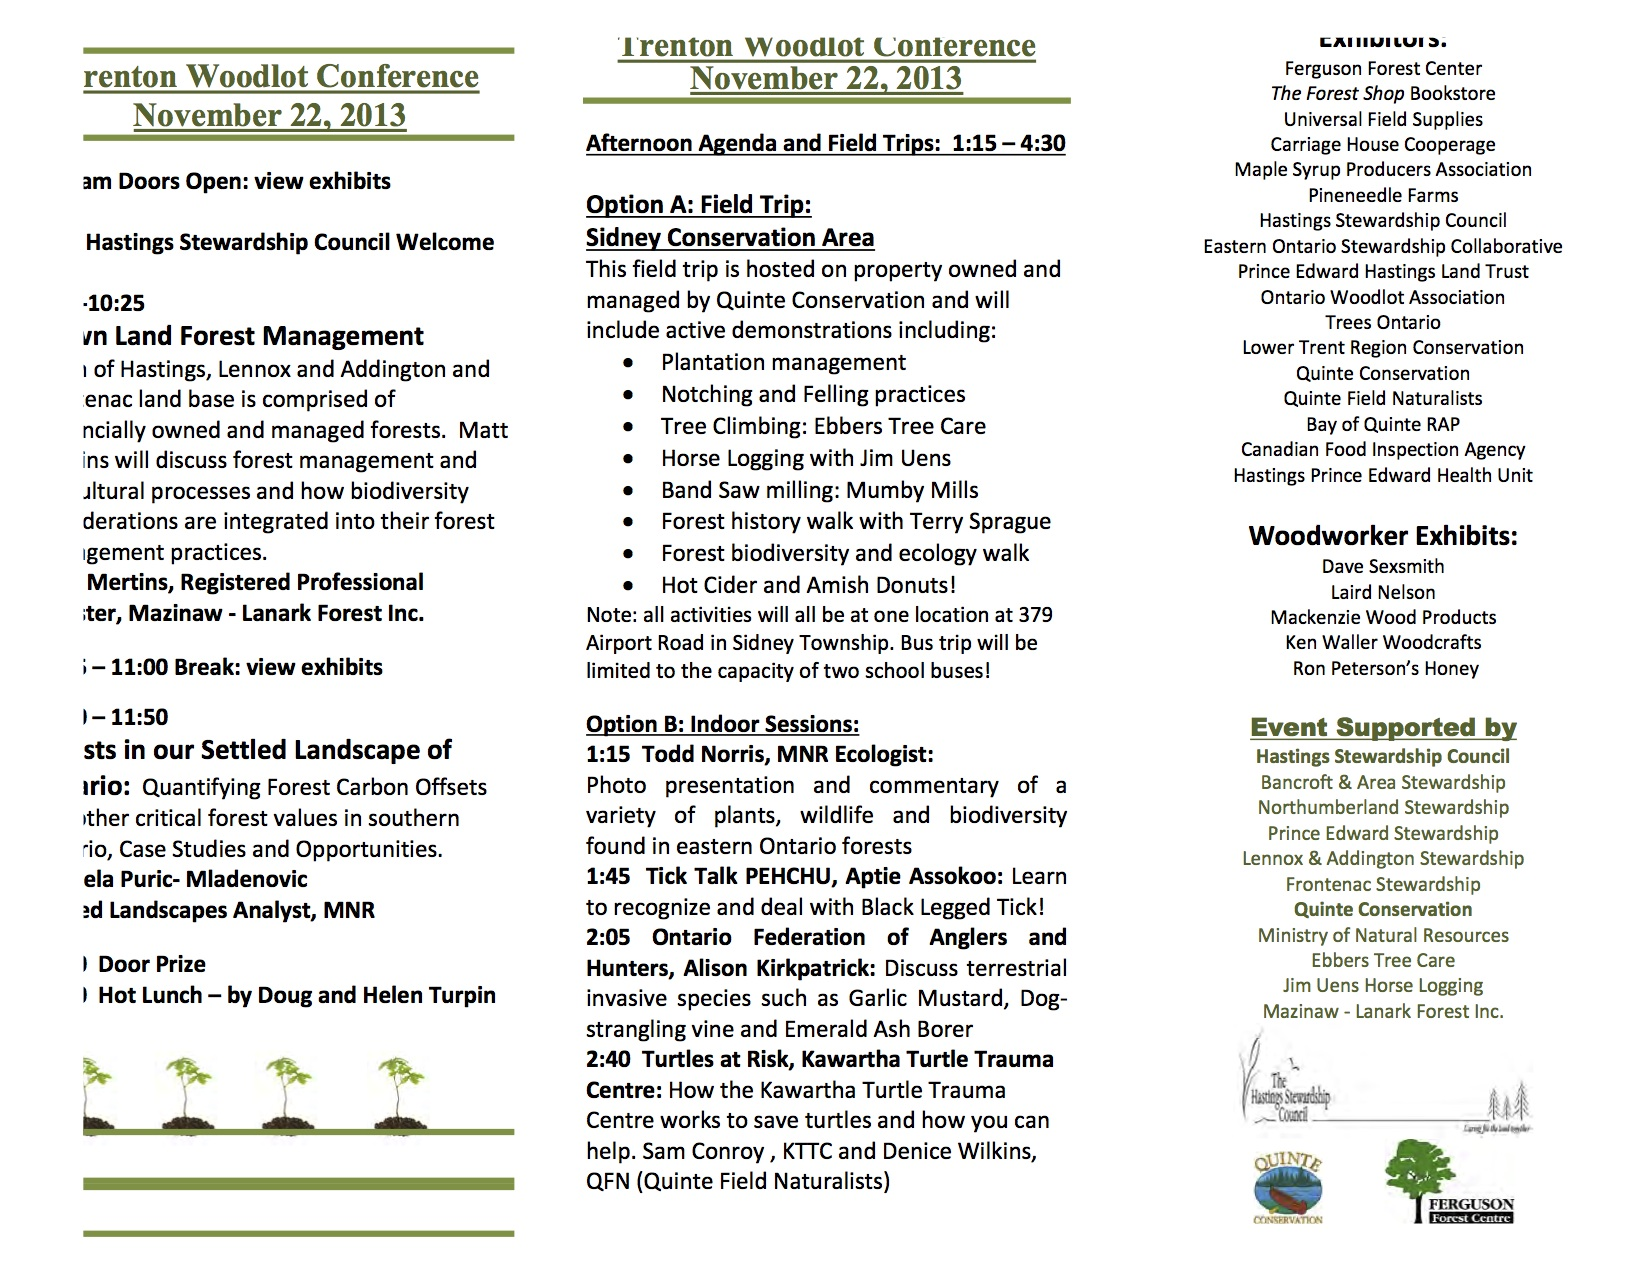 CTWC brochure final Nov 2013.sm.jpg